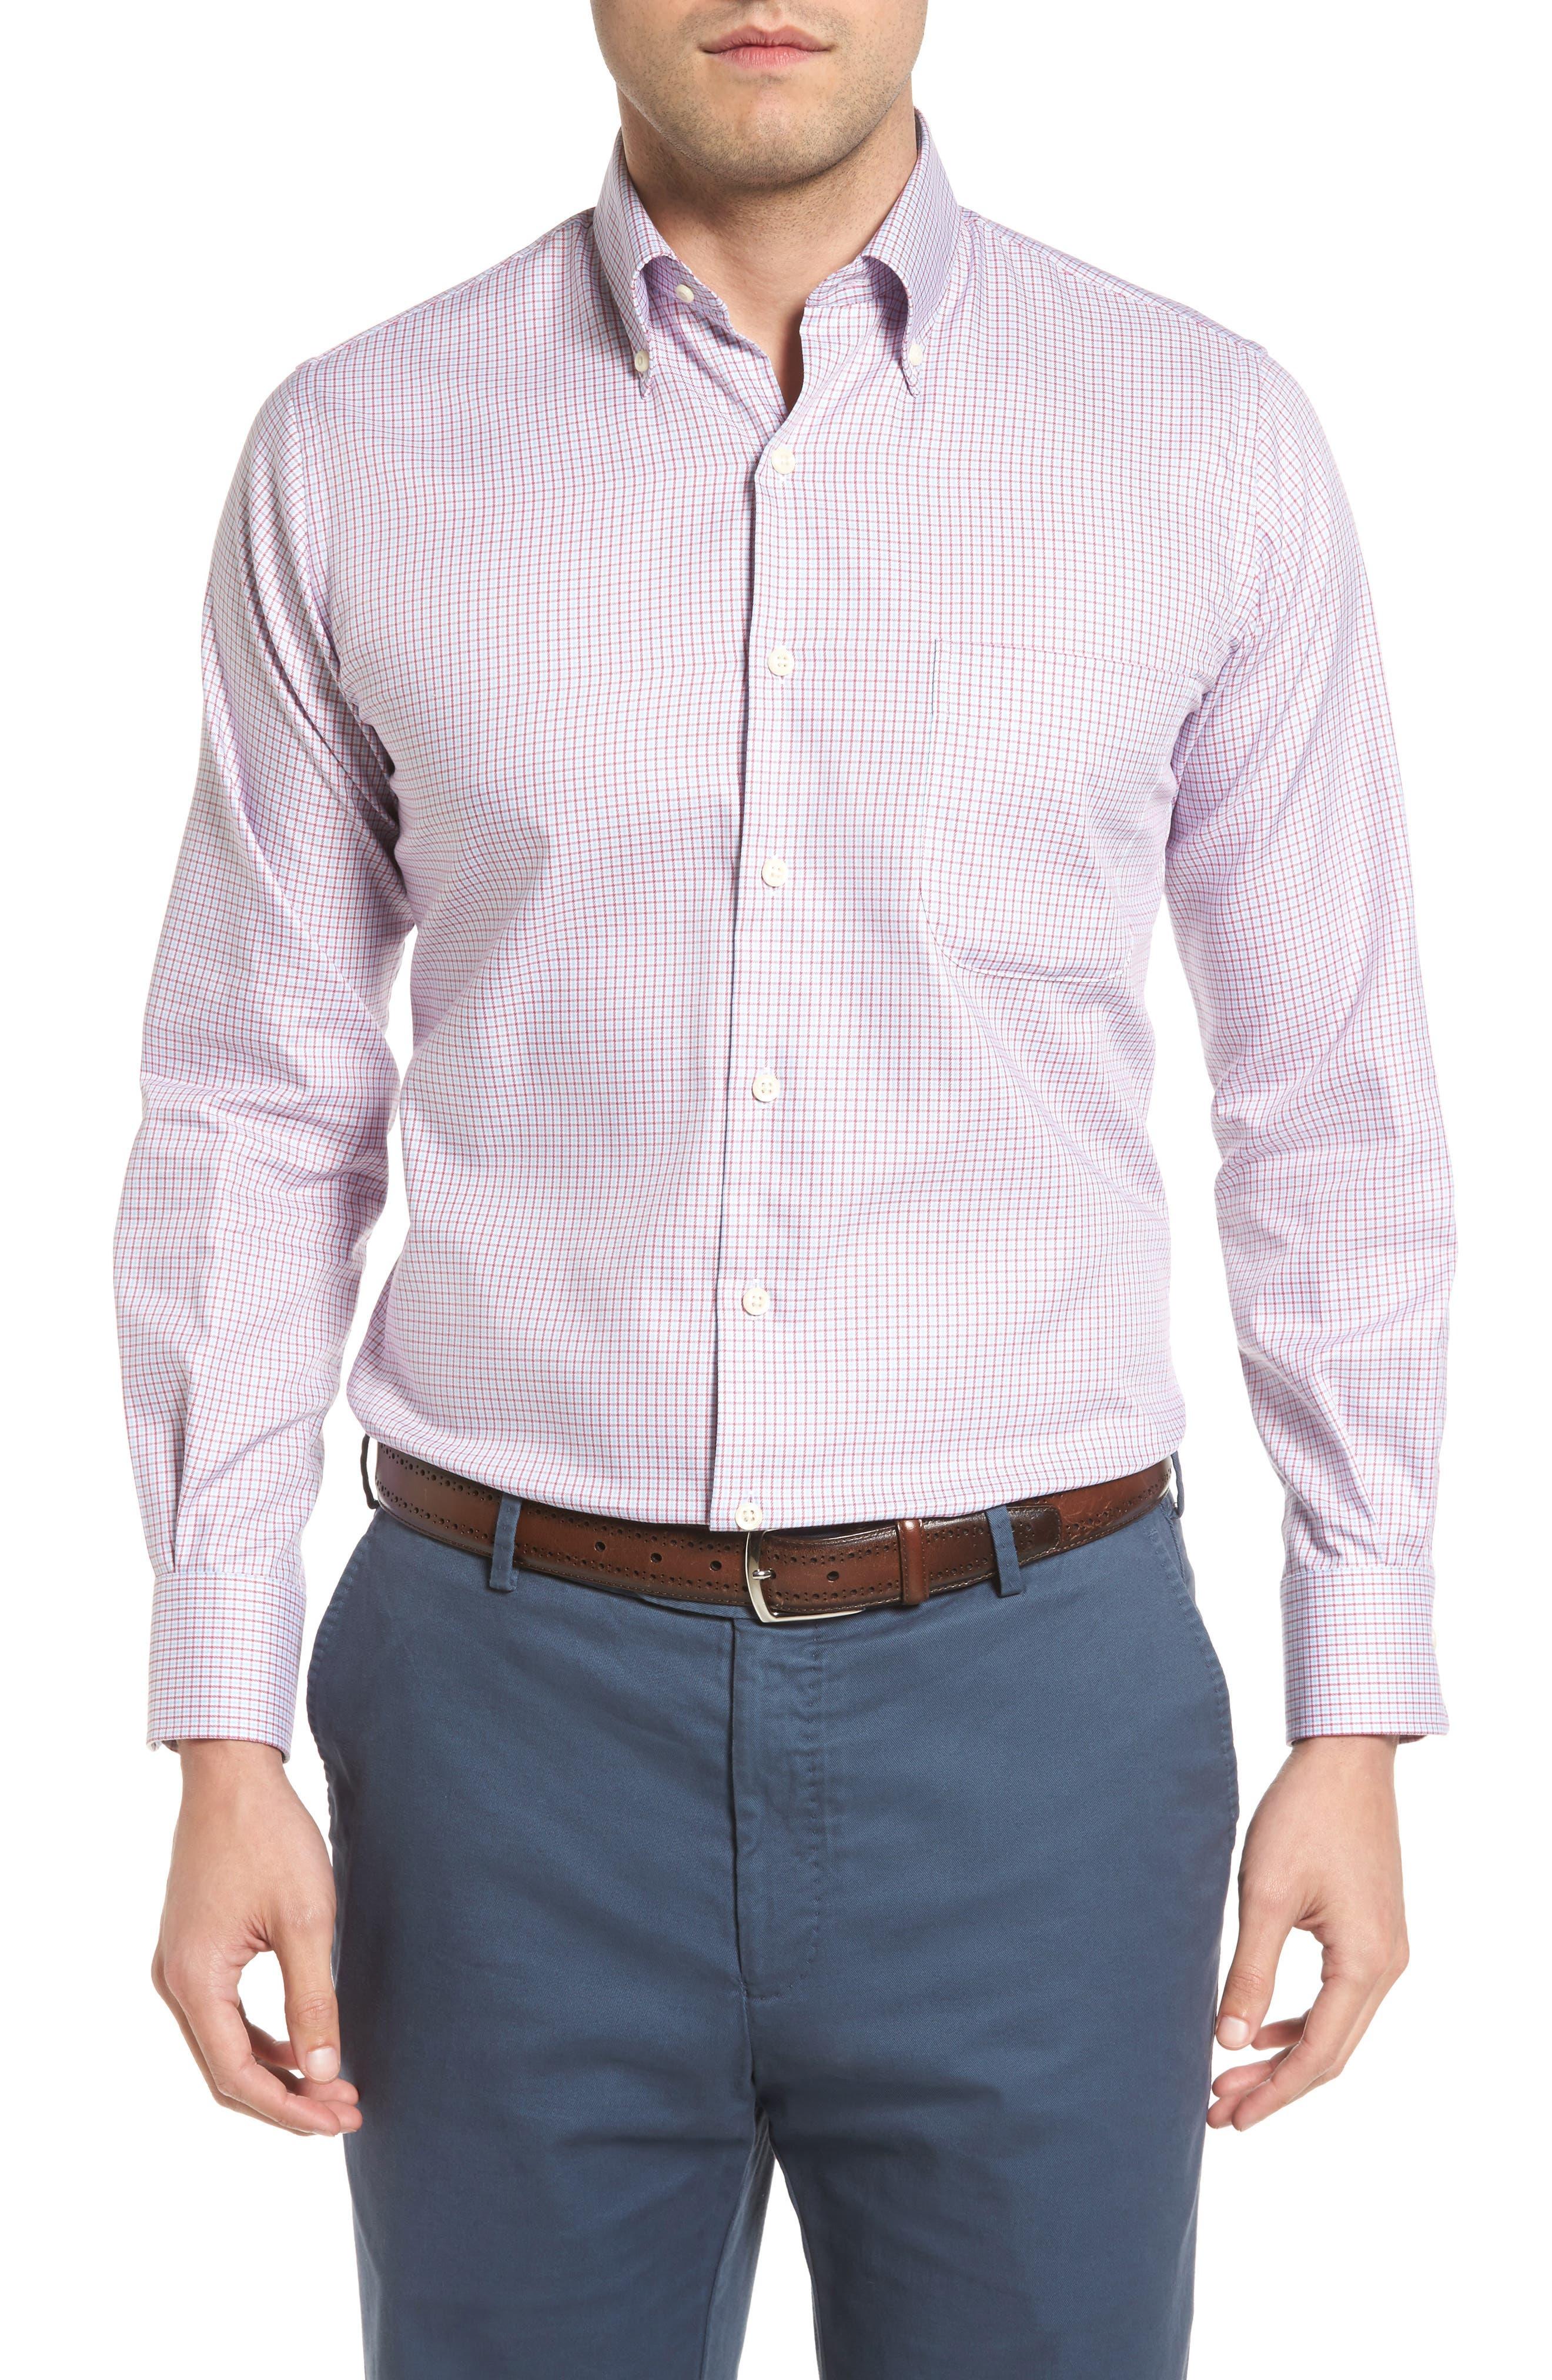 Peter Millar Regular Fit Elevation Puppytooth Sport Shirt